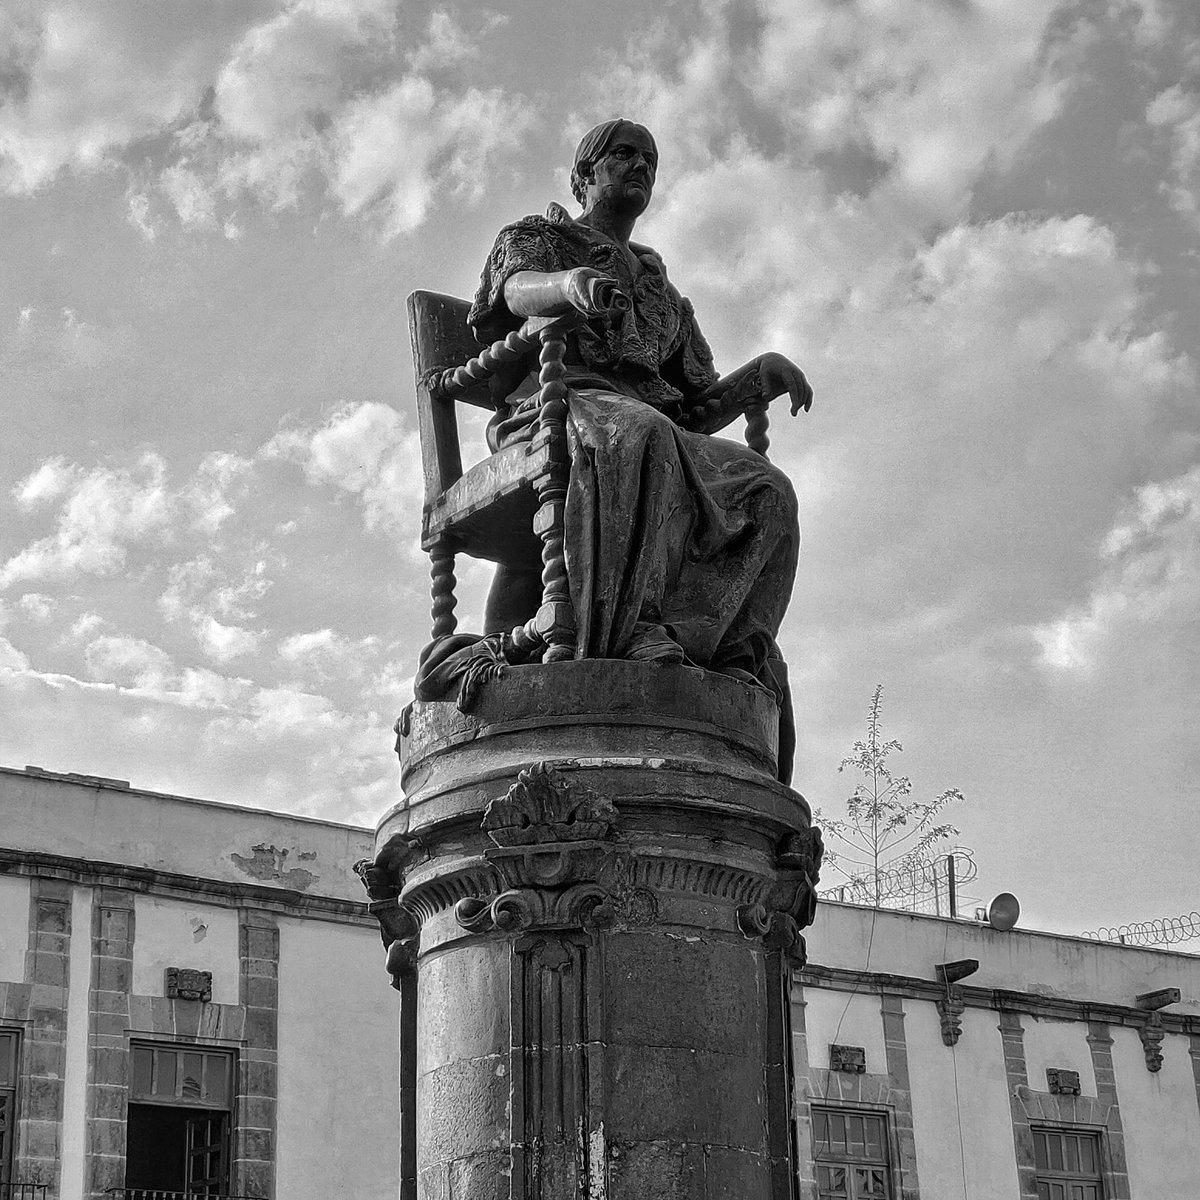 Josefa #Centro #plazadesantodomingo #estatua #statue #CDMX #monochrome #BlackAndWhite #blancoynegro #BlackAndWhitephoto #bnw #bnwphotography #street #streetphotography #citypics #cityphotography #streetshot #urbanphotography #cityscape #mi9t #cityshots #sky #cielo #clouds #nubespic.twitter.com/cFL7u2bj0M